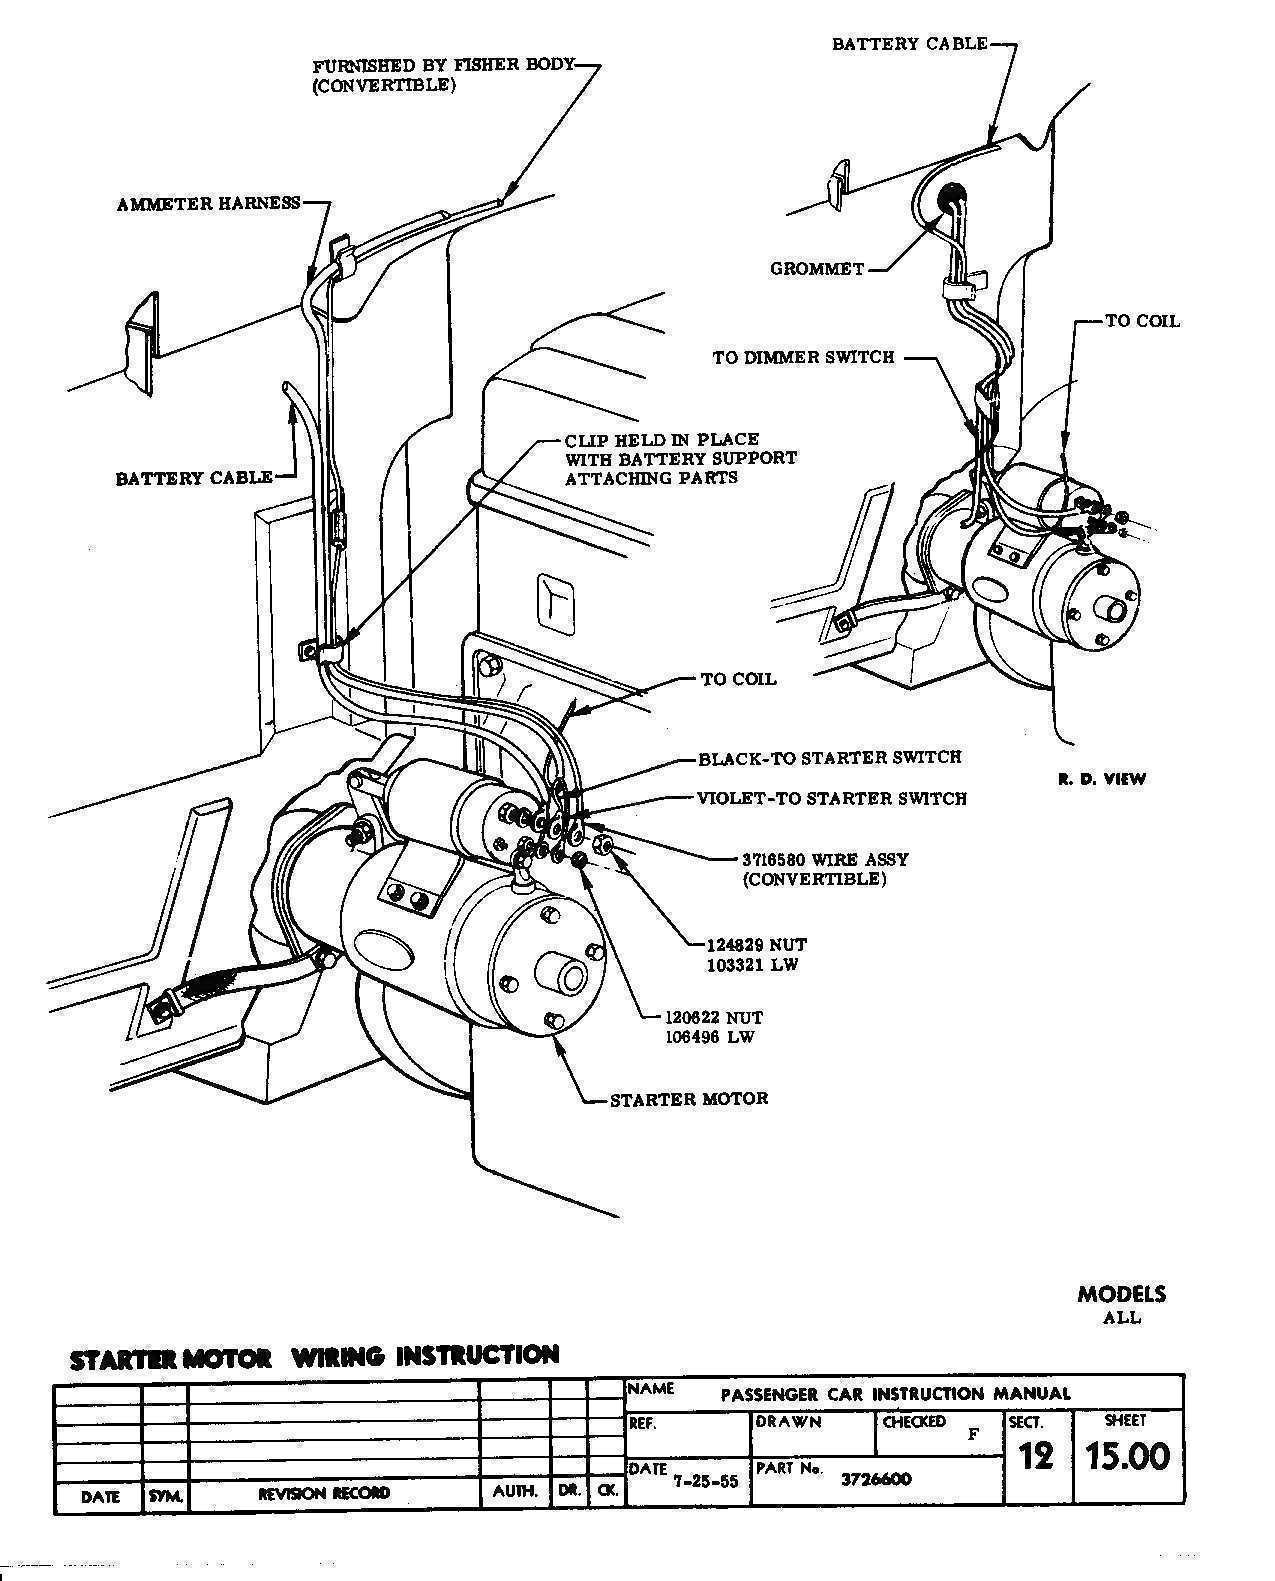 Small Block Chevy Starter Wiring Diagram | Wiring Diagram - Starter Solenoid Wiring Diagram Chevy